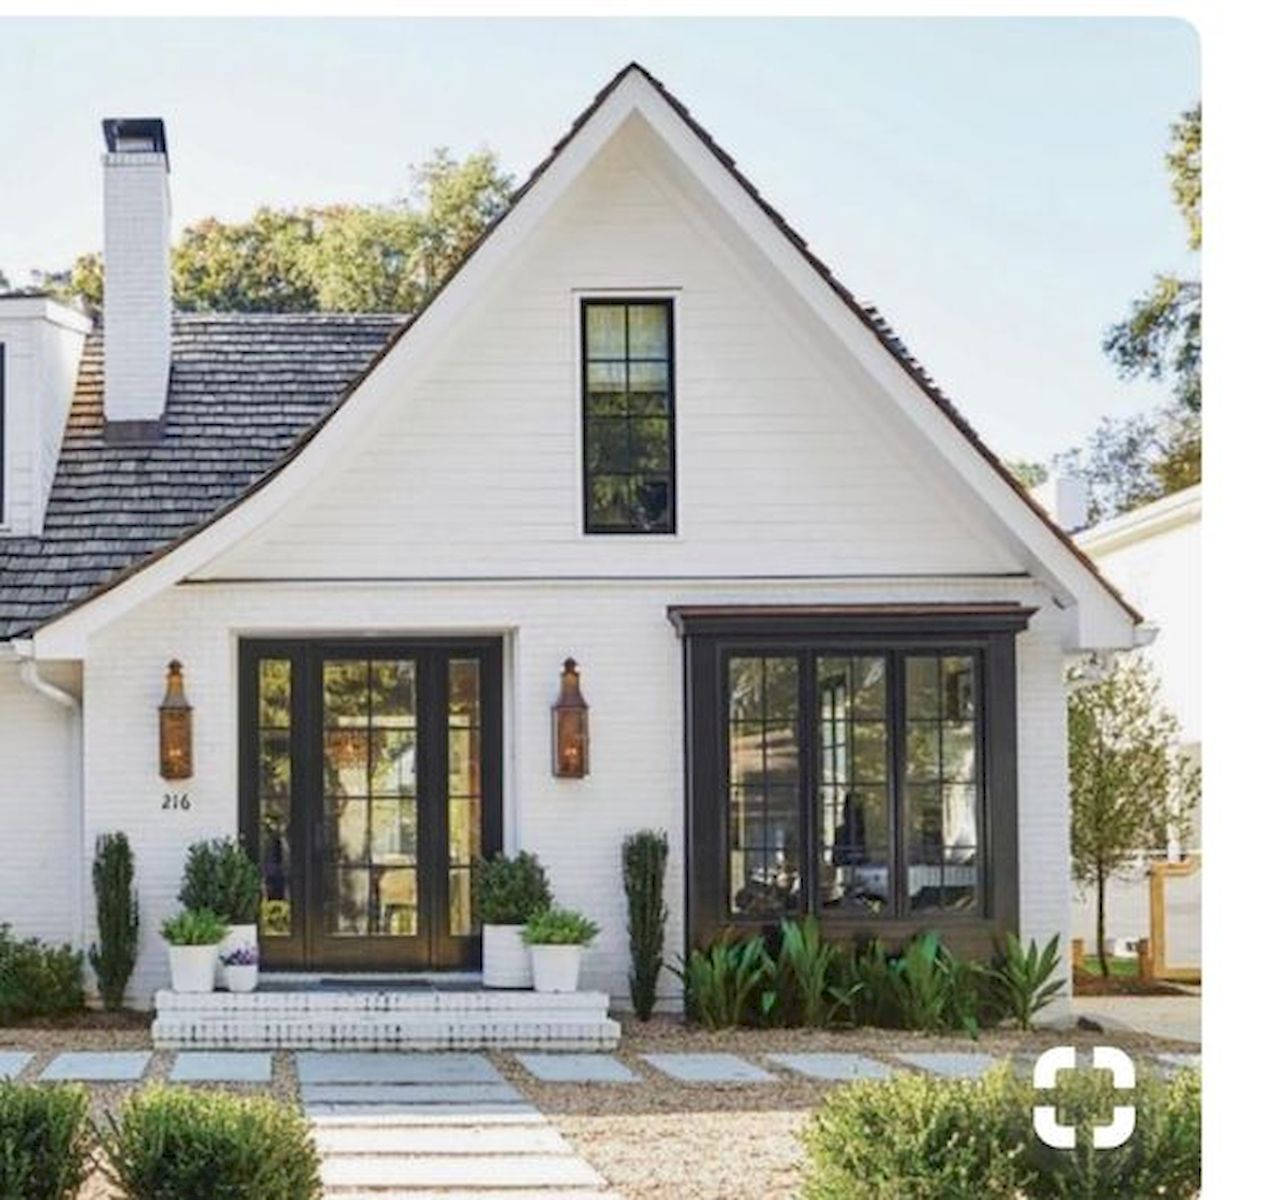 Modern Farmhouse Exterior Designs 11: 33 Beautiful Modern Farmhouse Exterior Design Ideas